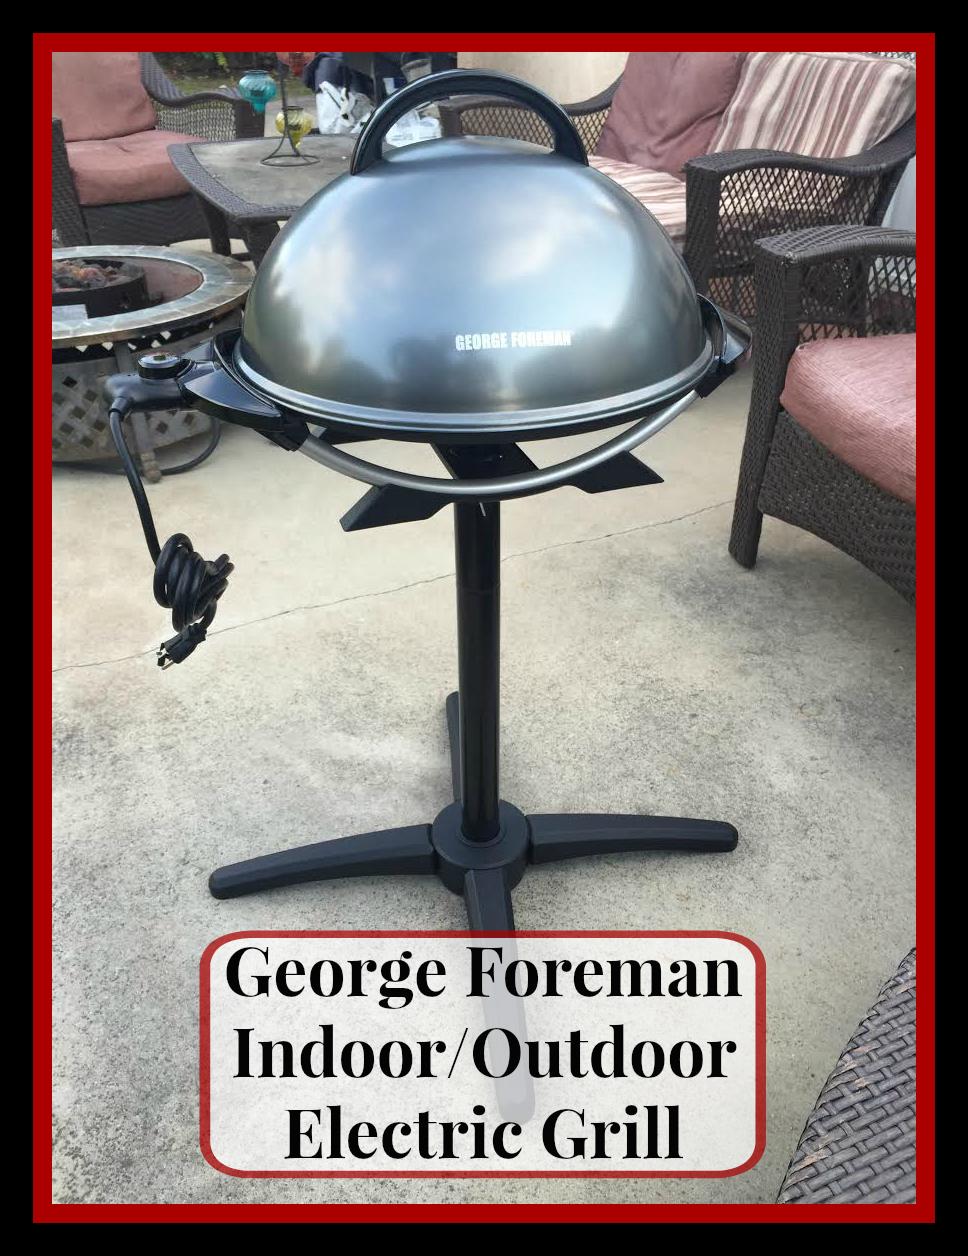 #GeorgeForeman #Grilling #SummerFun #ad